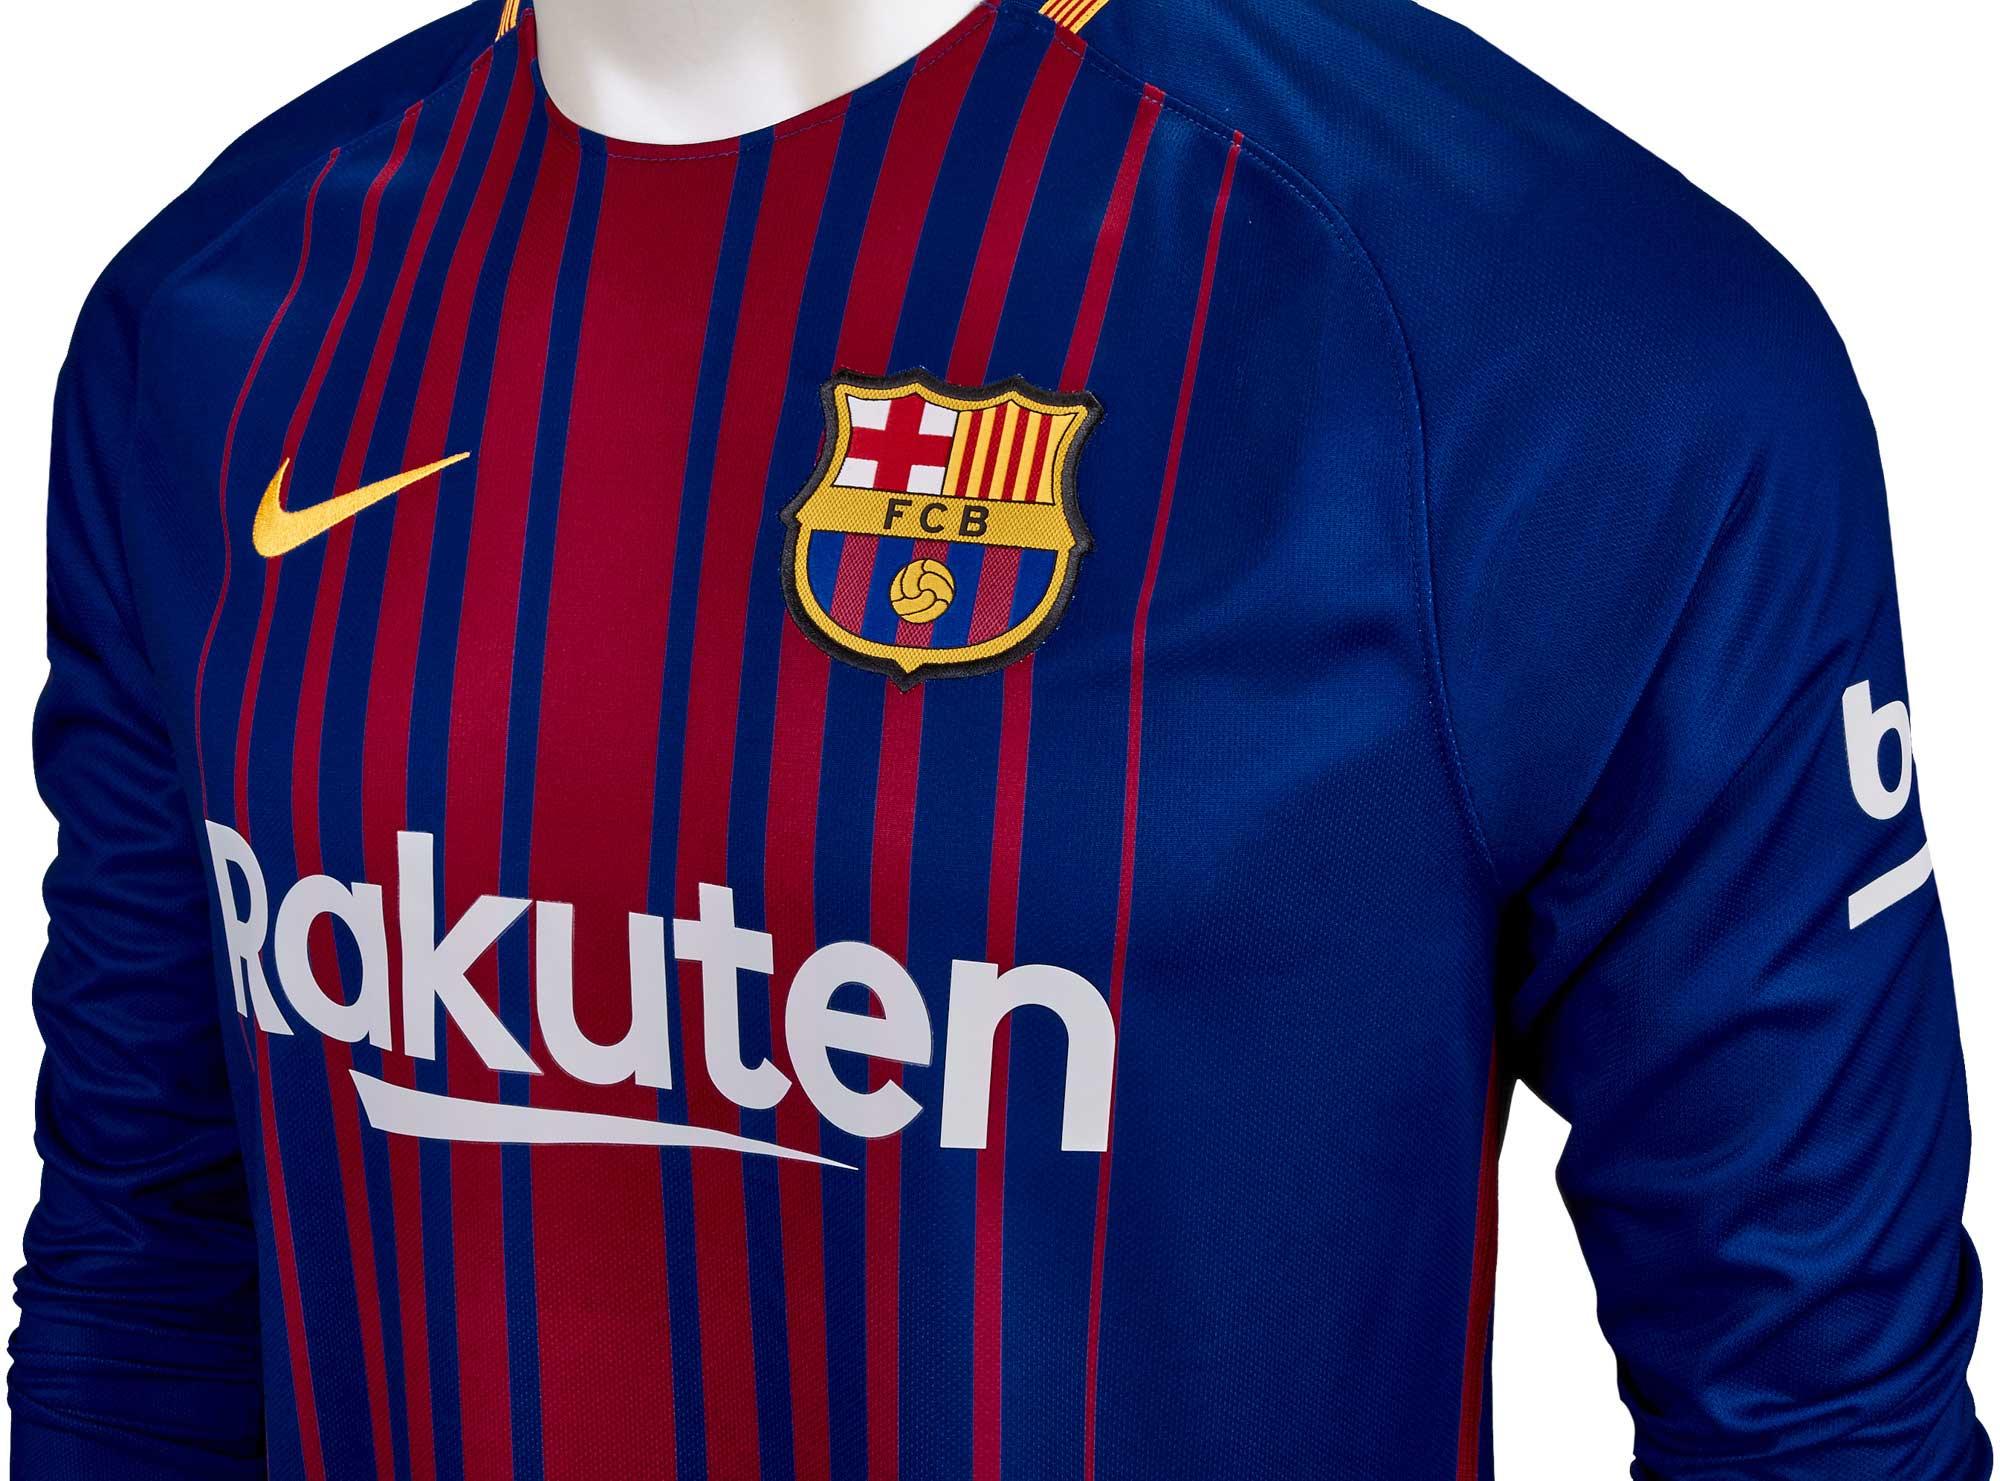 3edf43f8c16 2017 18 Nike Barcelona Home L S Jersey - SoccerPro.com